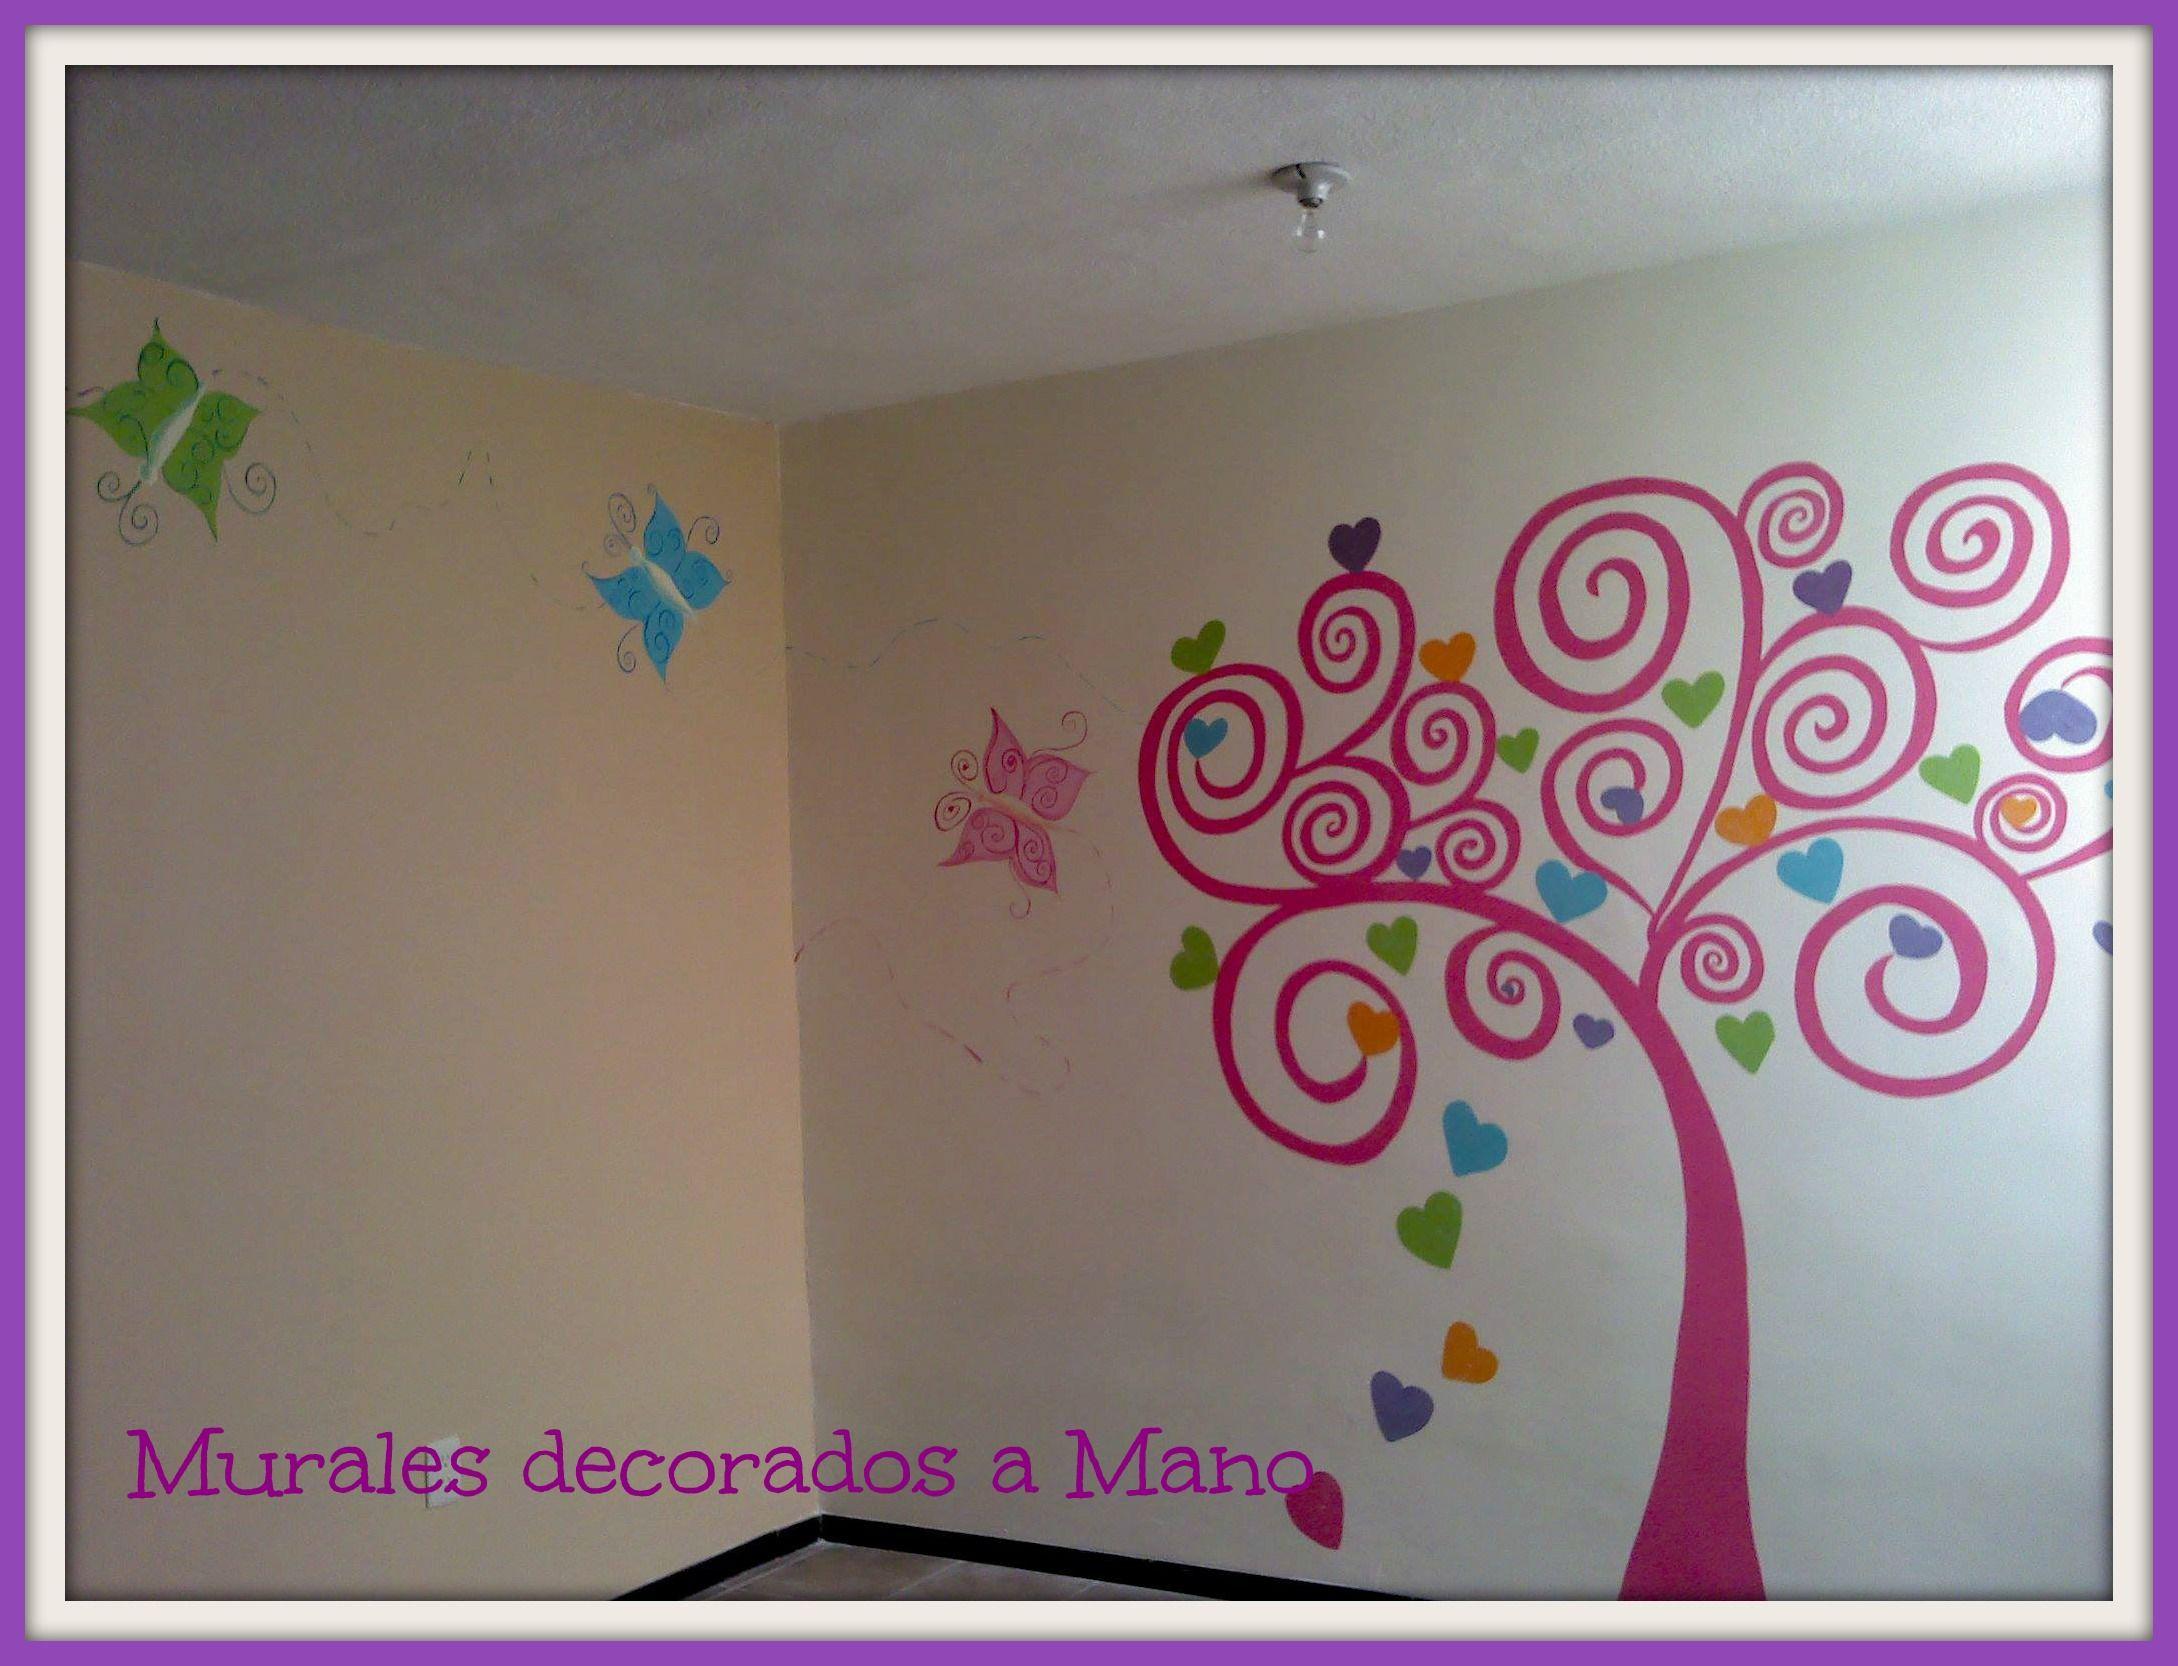 Murales decorativos pintados a mano bellos detalles que - Murales pintados a mano ...